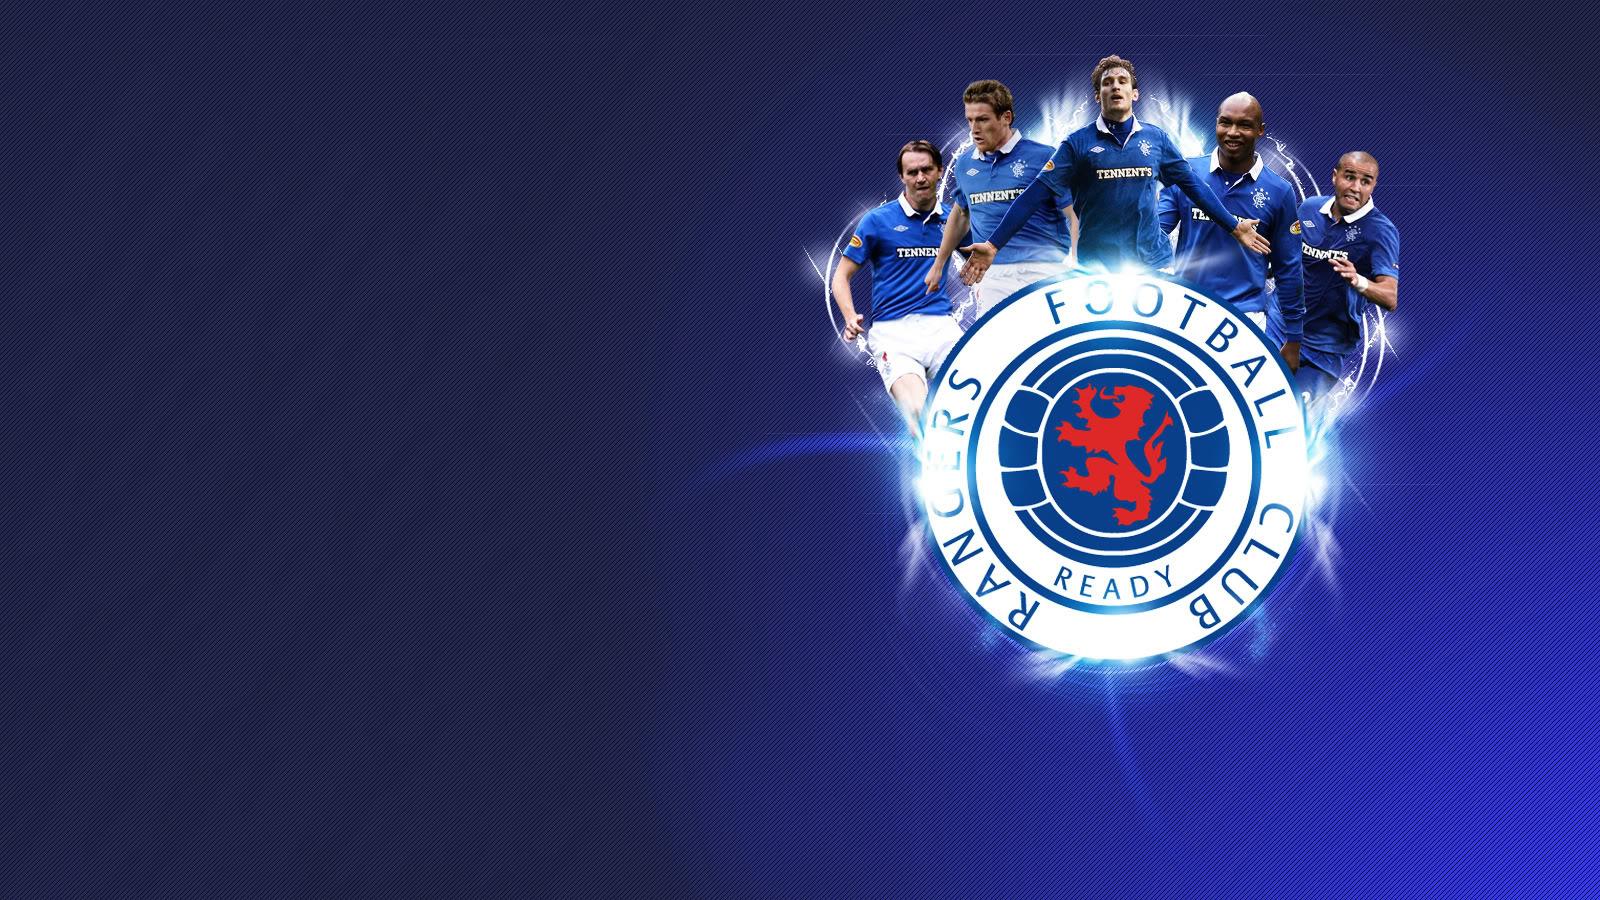 Glasgow Rangers Wallpaper - WallpaperSafari Soccer Backgrounds For Iphone